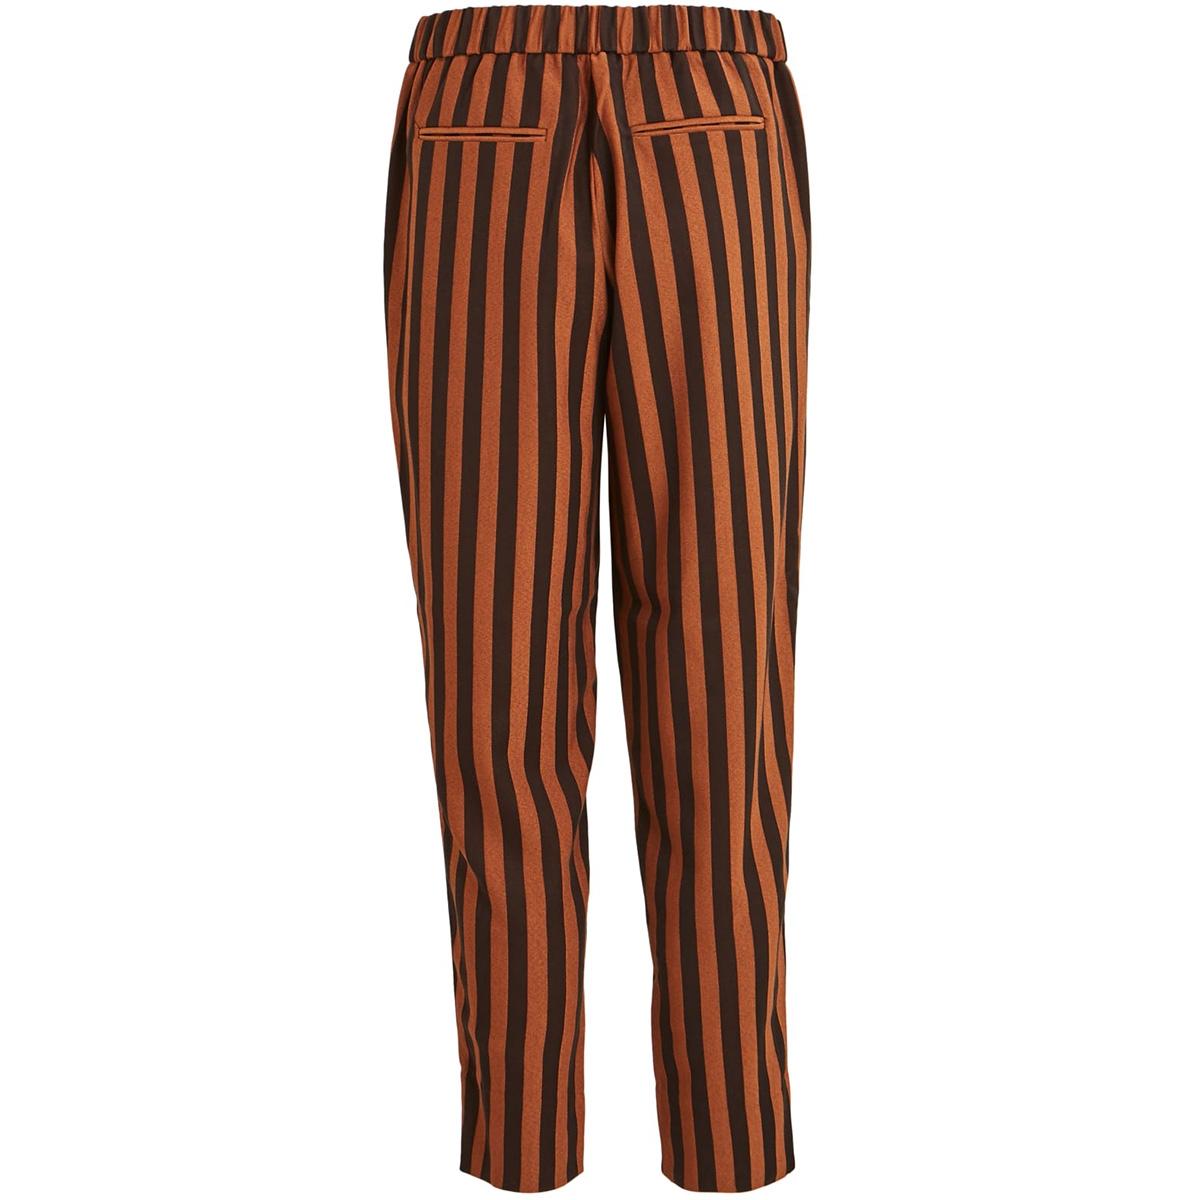 objgin siringo pant 105 23030533 object broek black/brown patin